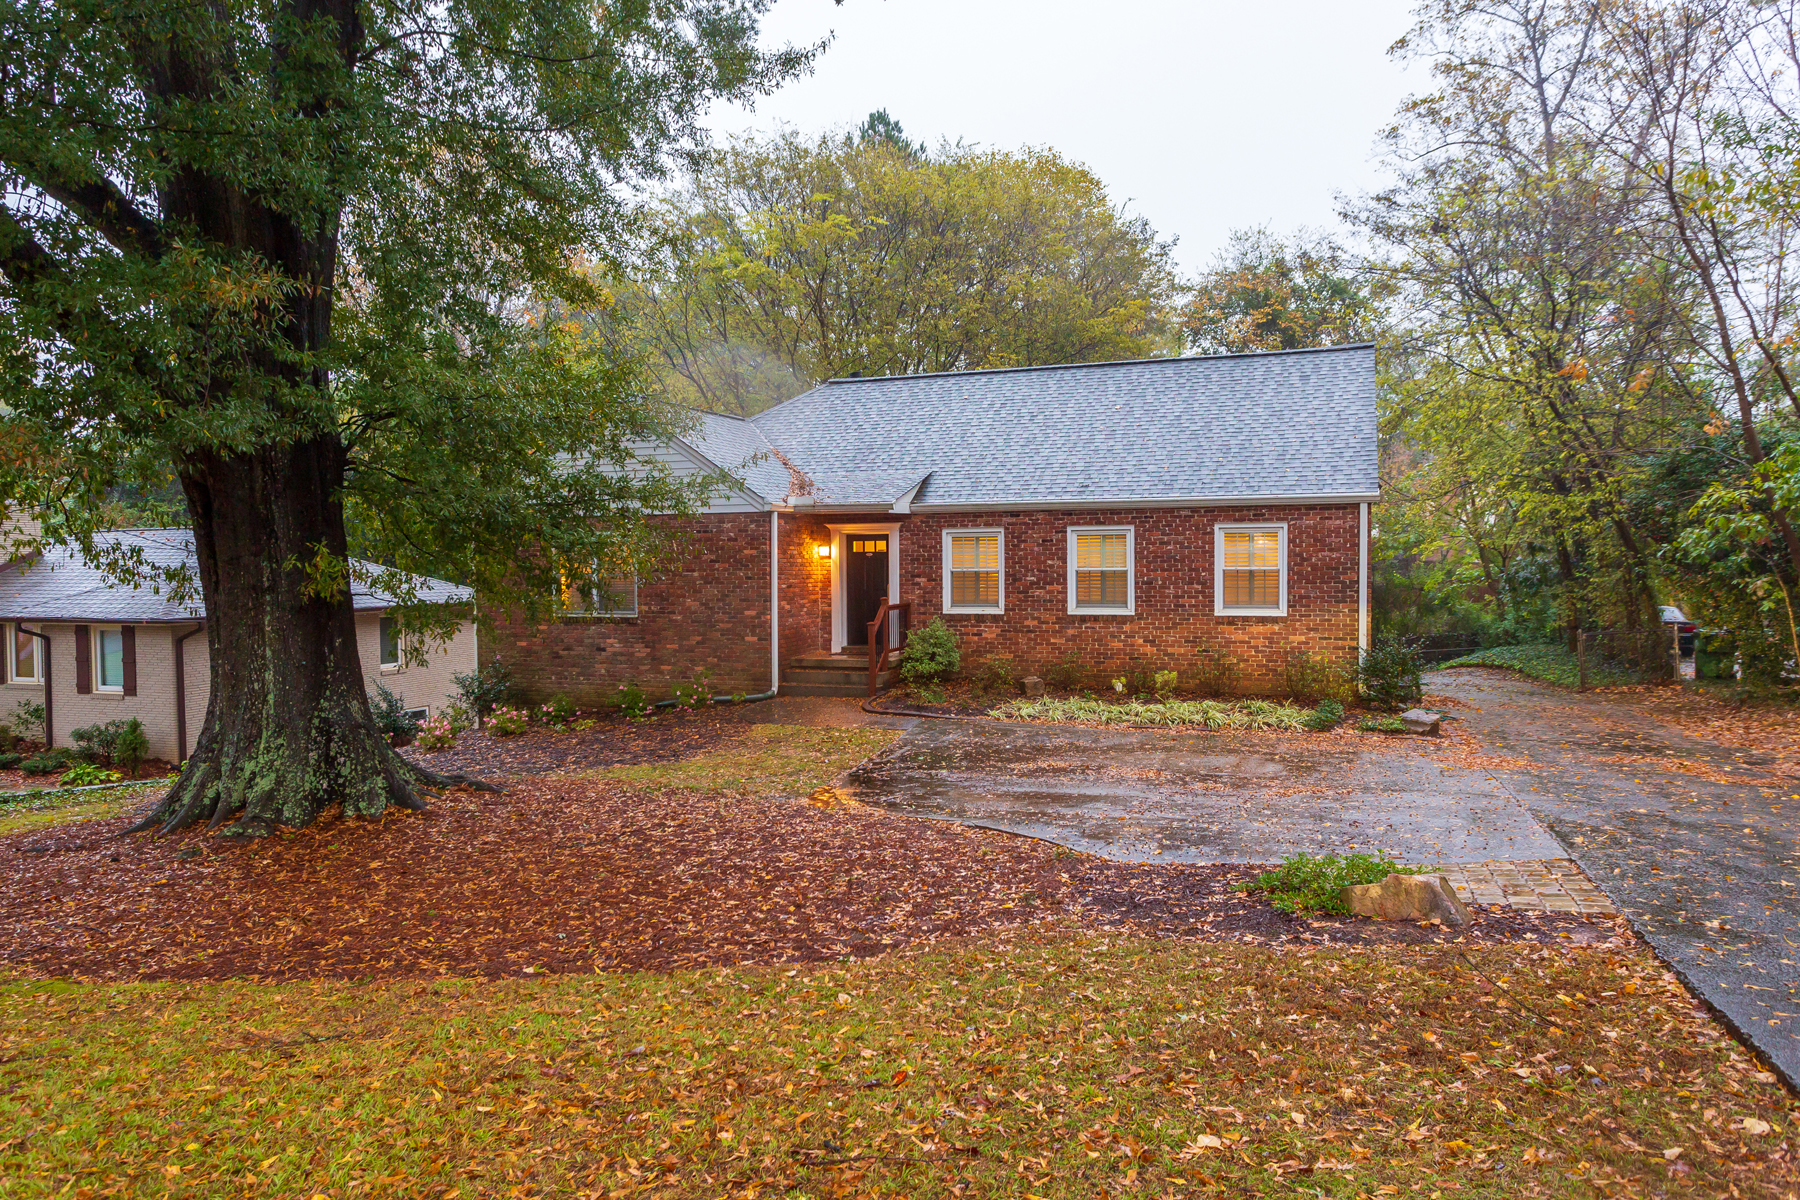 Single Family Home for Sale at Lavista Park Cottage 2453 Elizabeth Ann Ln Atlanta, Georgia 30324 United States